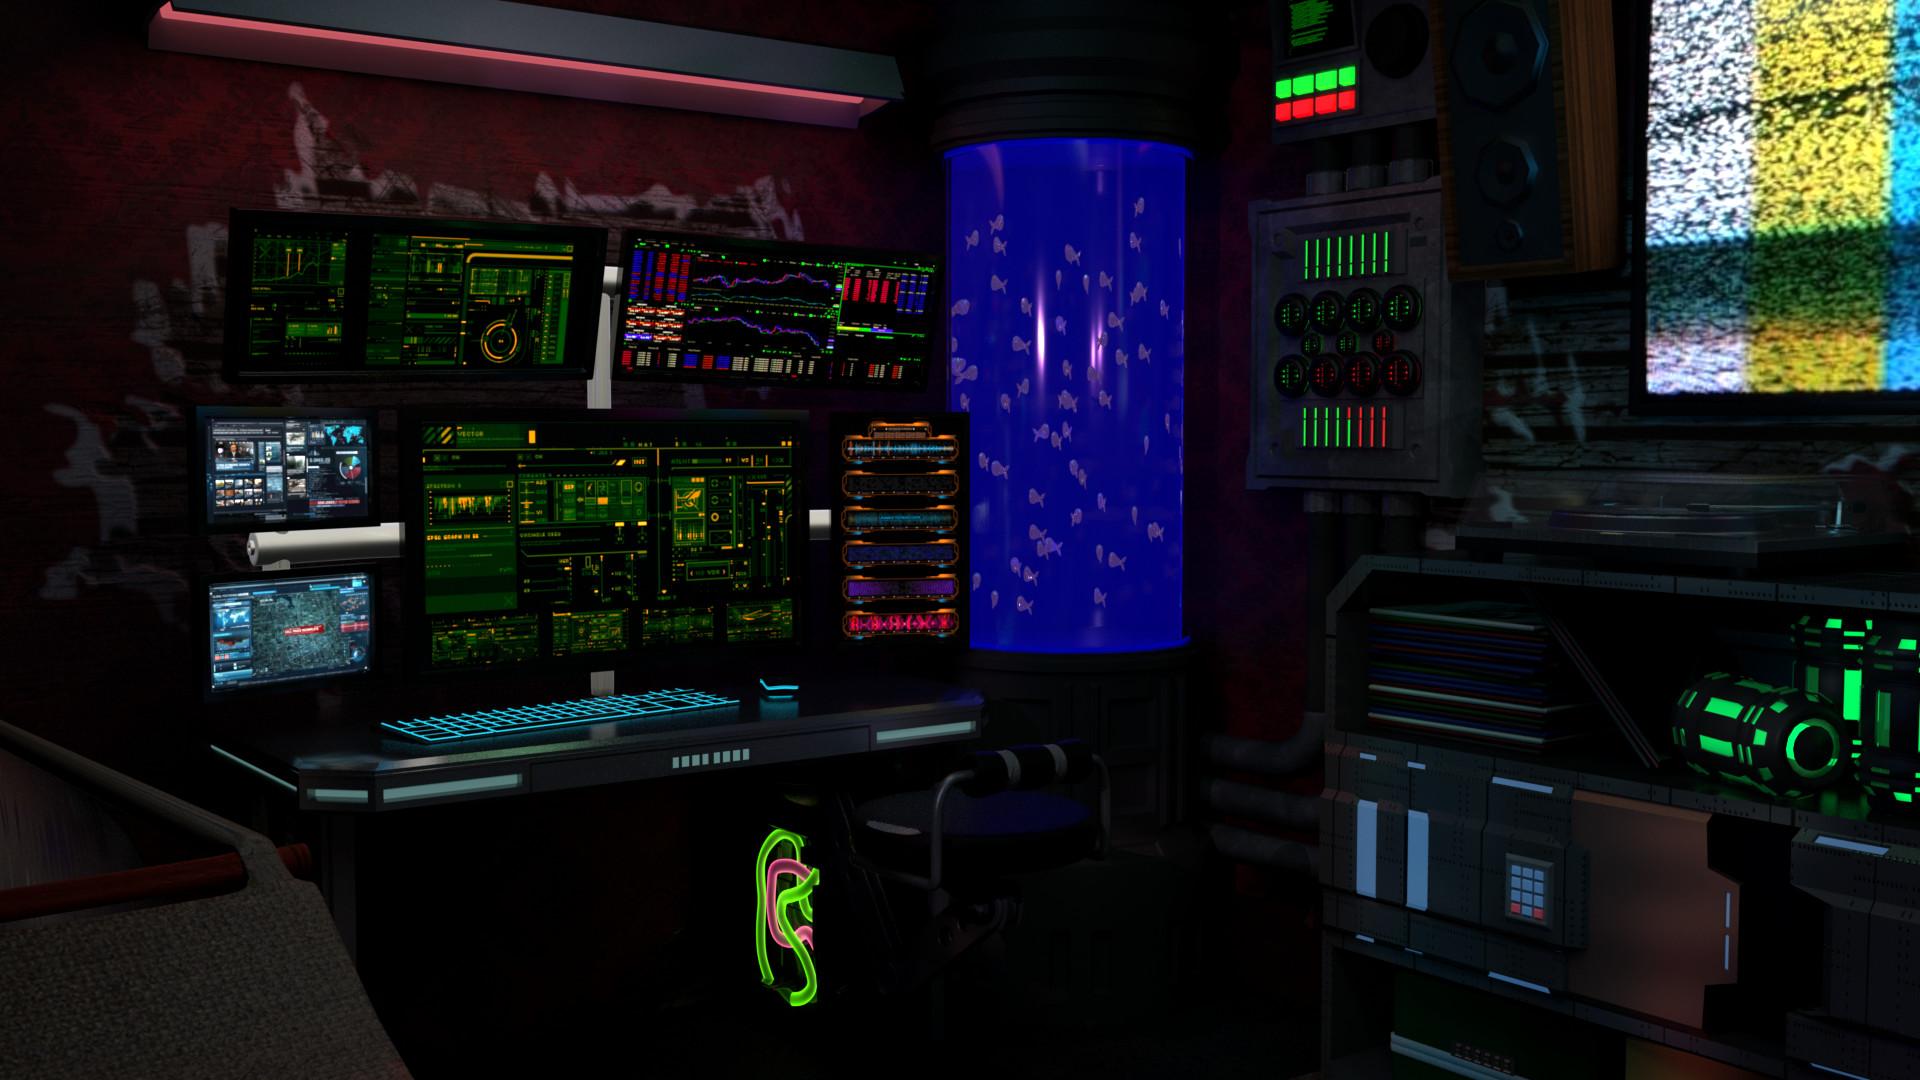 ArtStation  CyberPunk Room Jason Goldwine